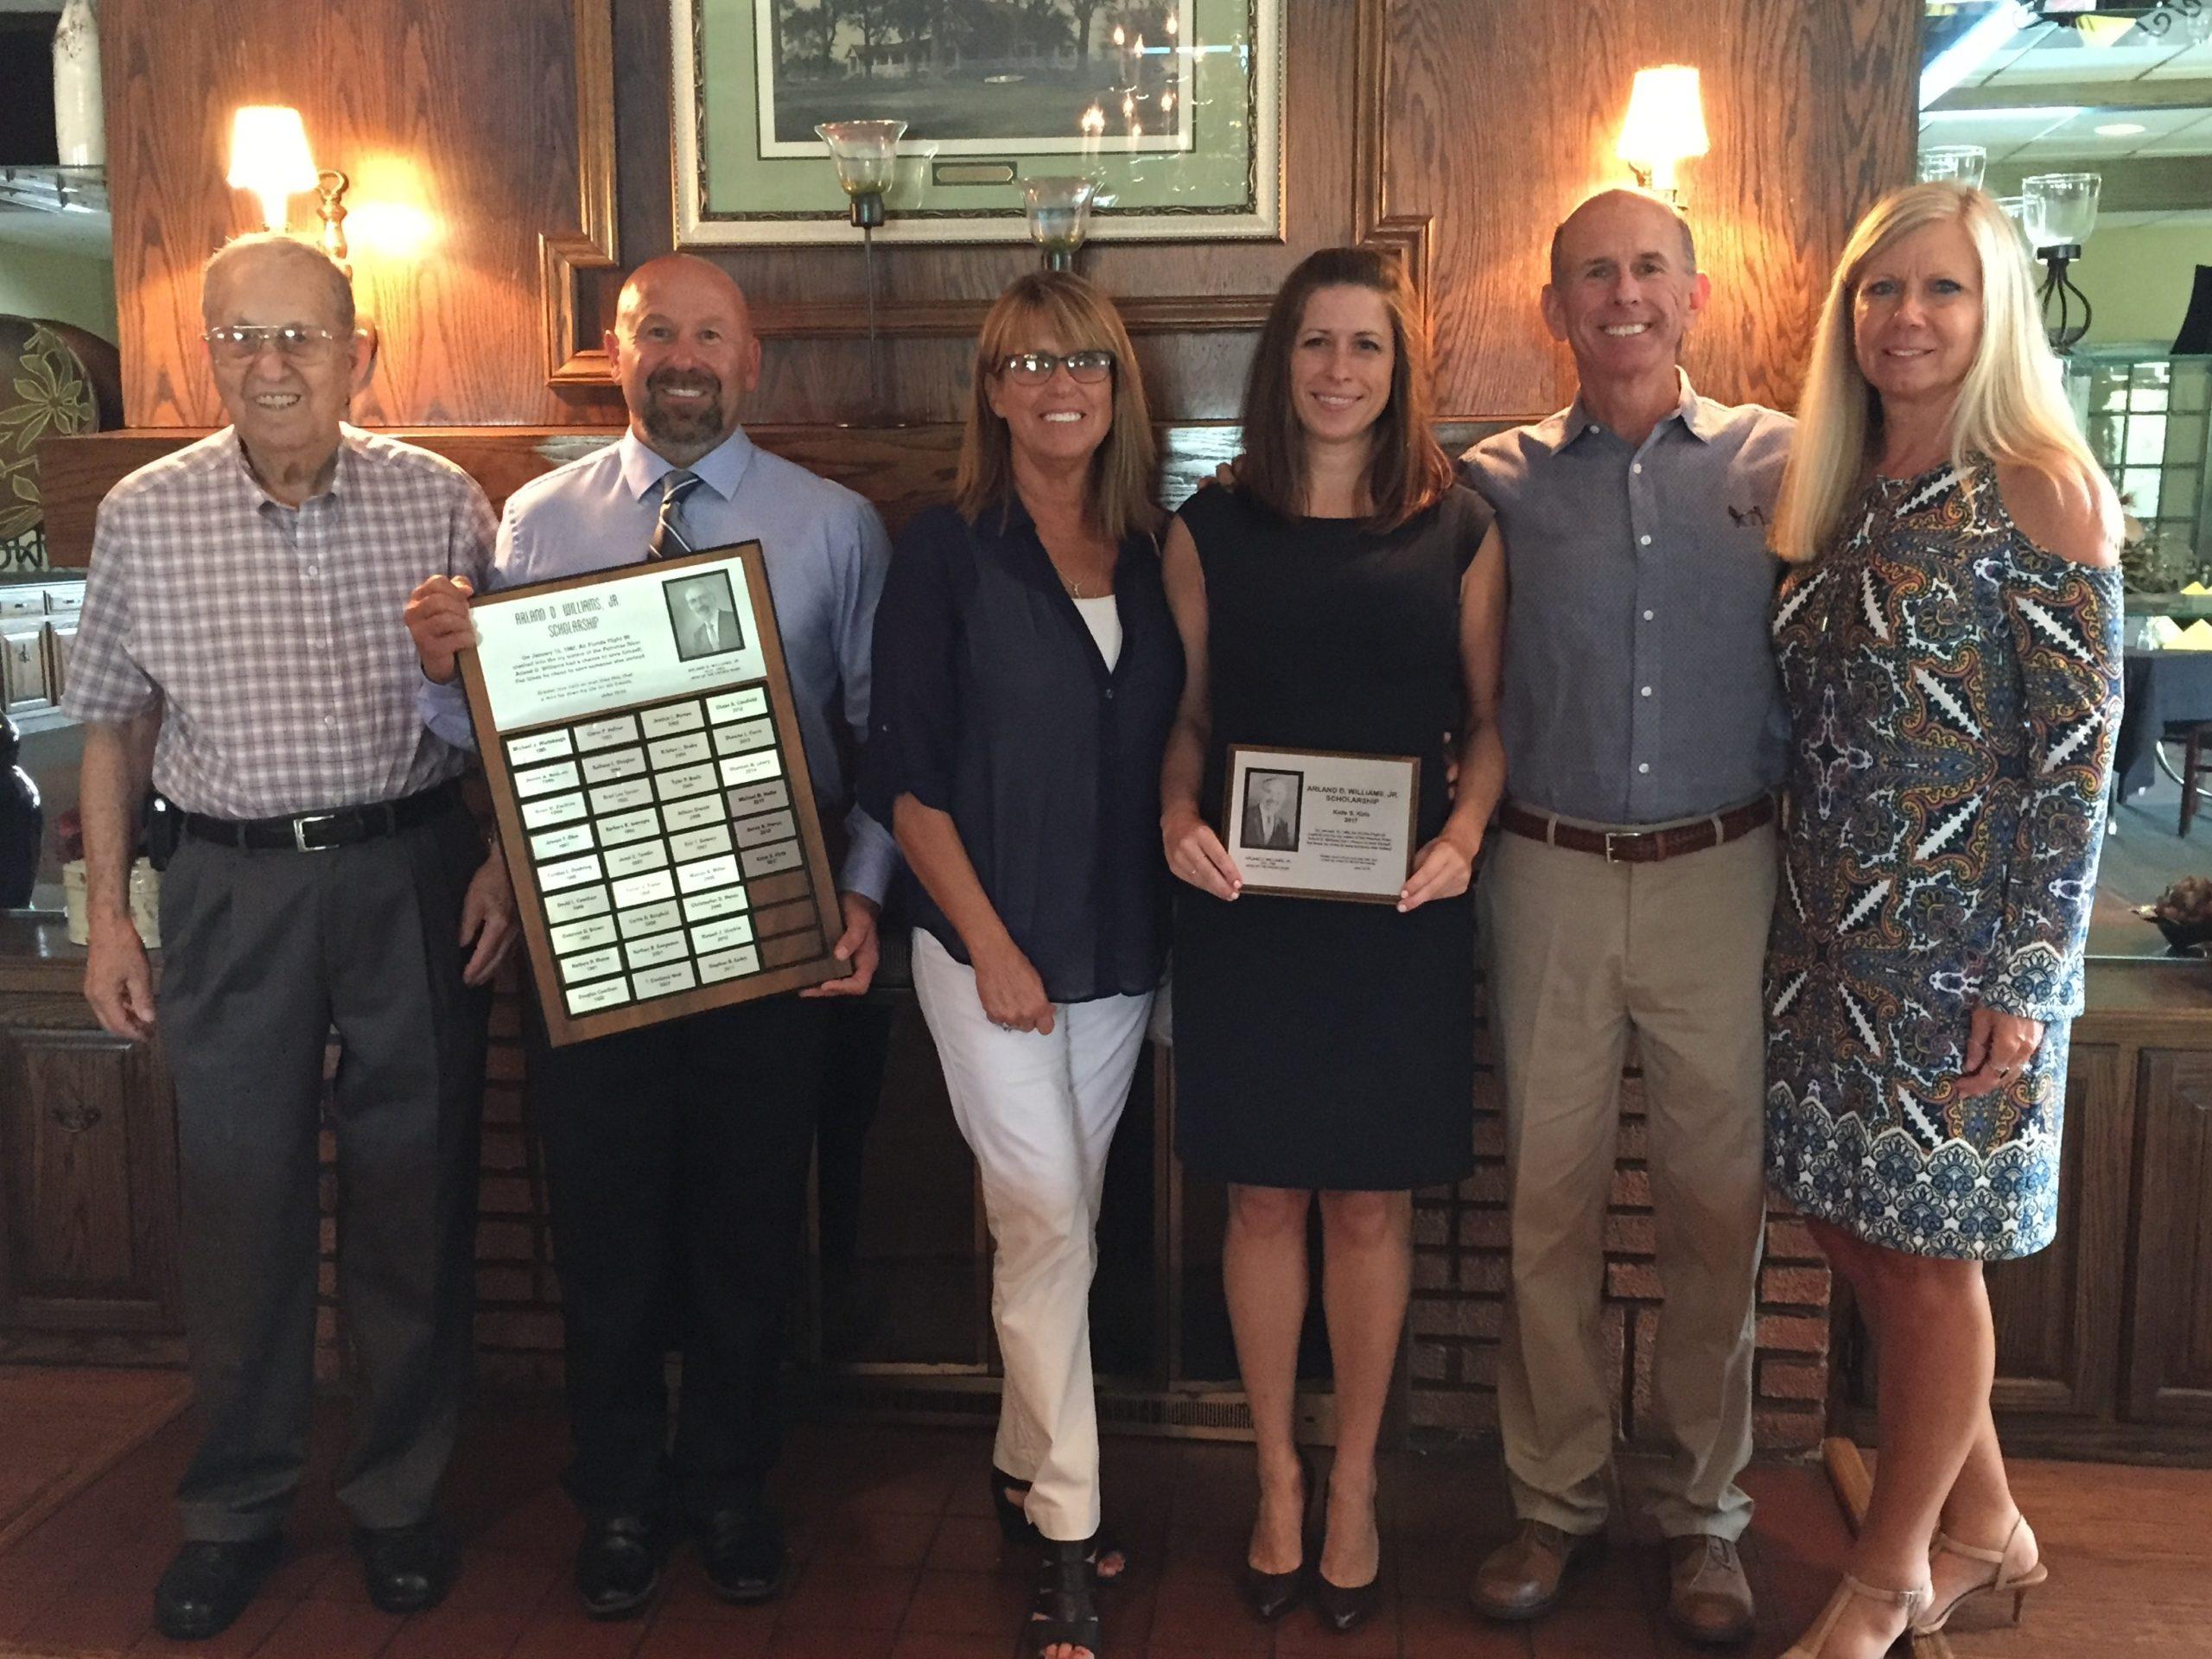 Arland D. Williams Jr. Scholarship awarded to Katie Kirts